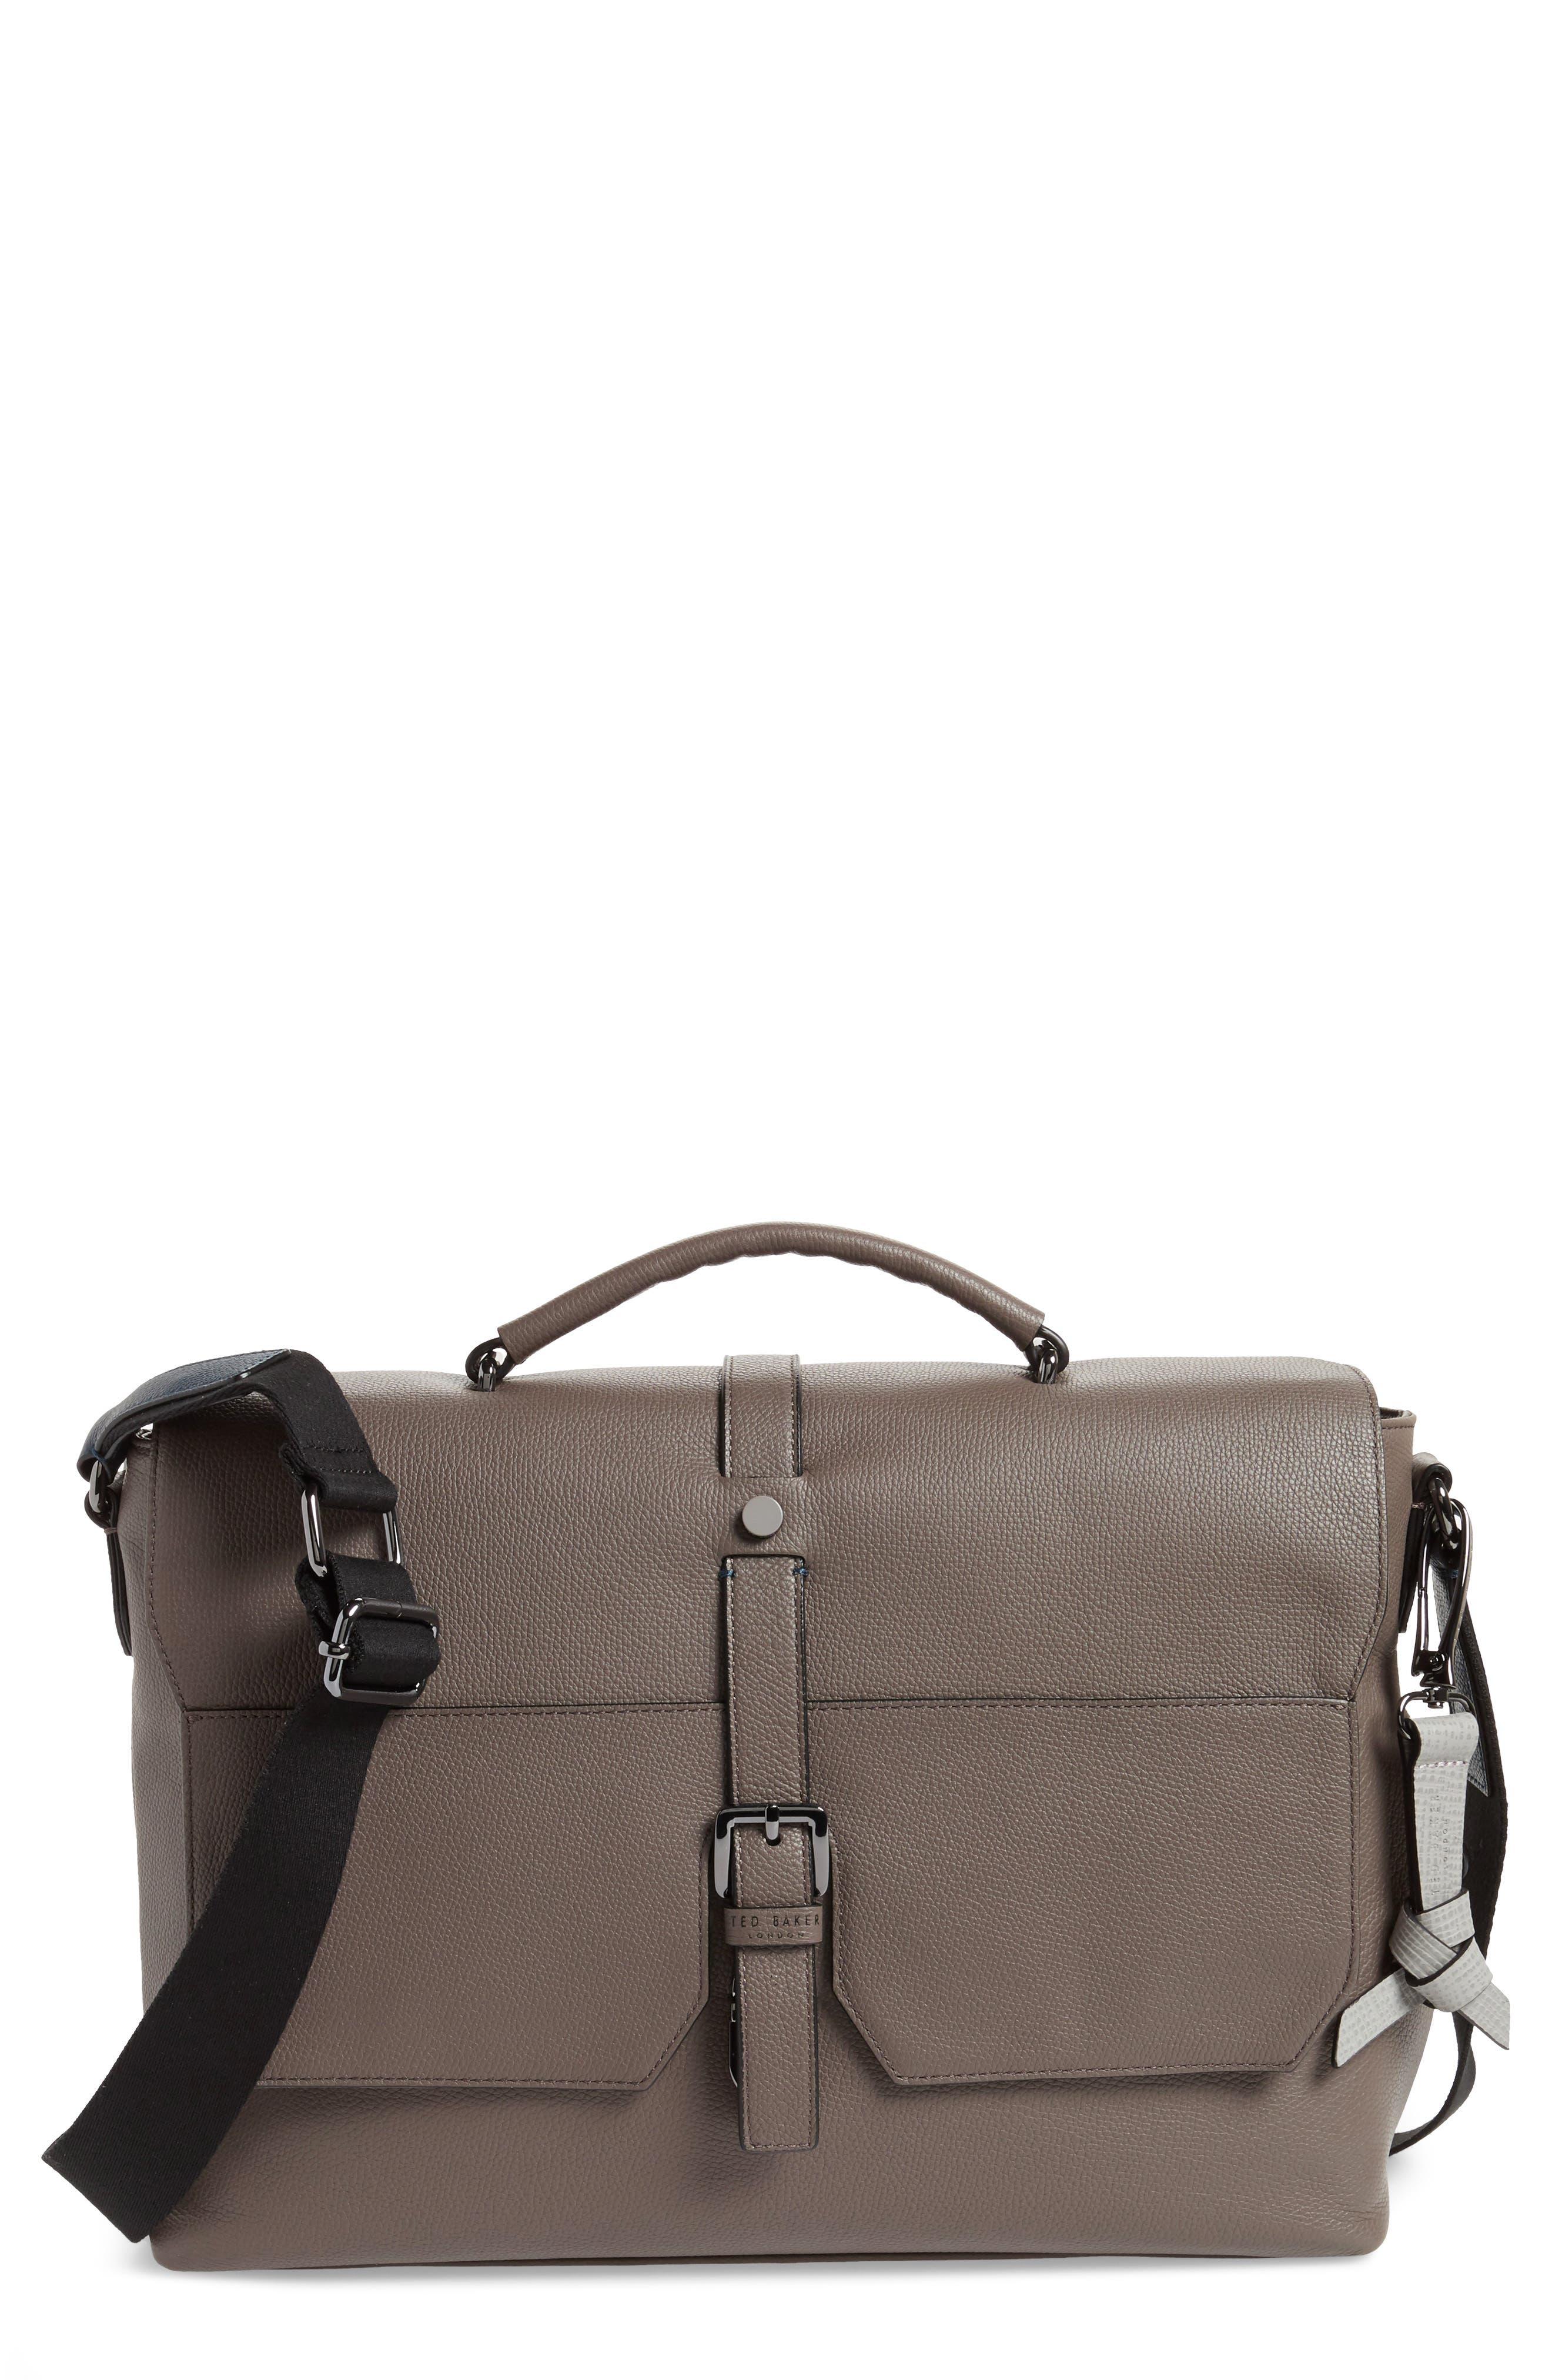 Ted Baker Sandune Leather Messenger Bag,                             Main thumbnail 1, color,                             030